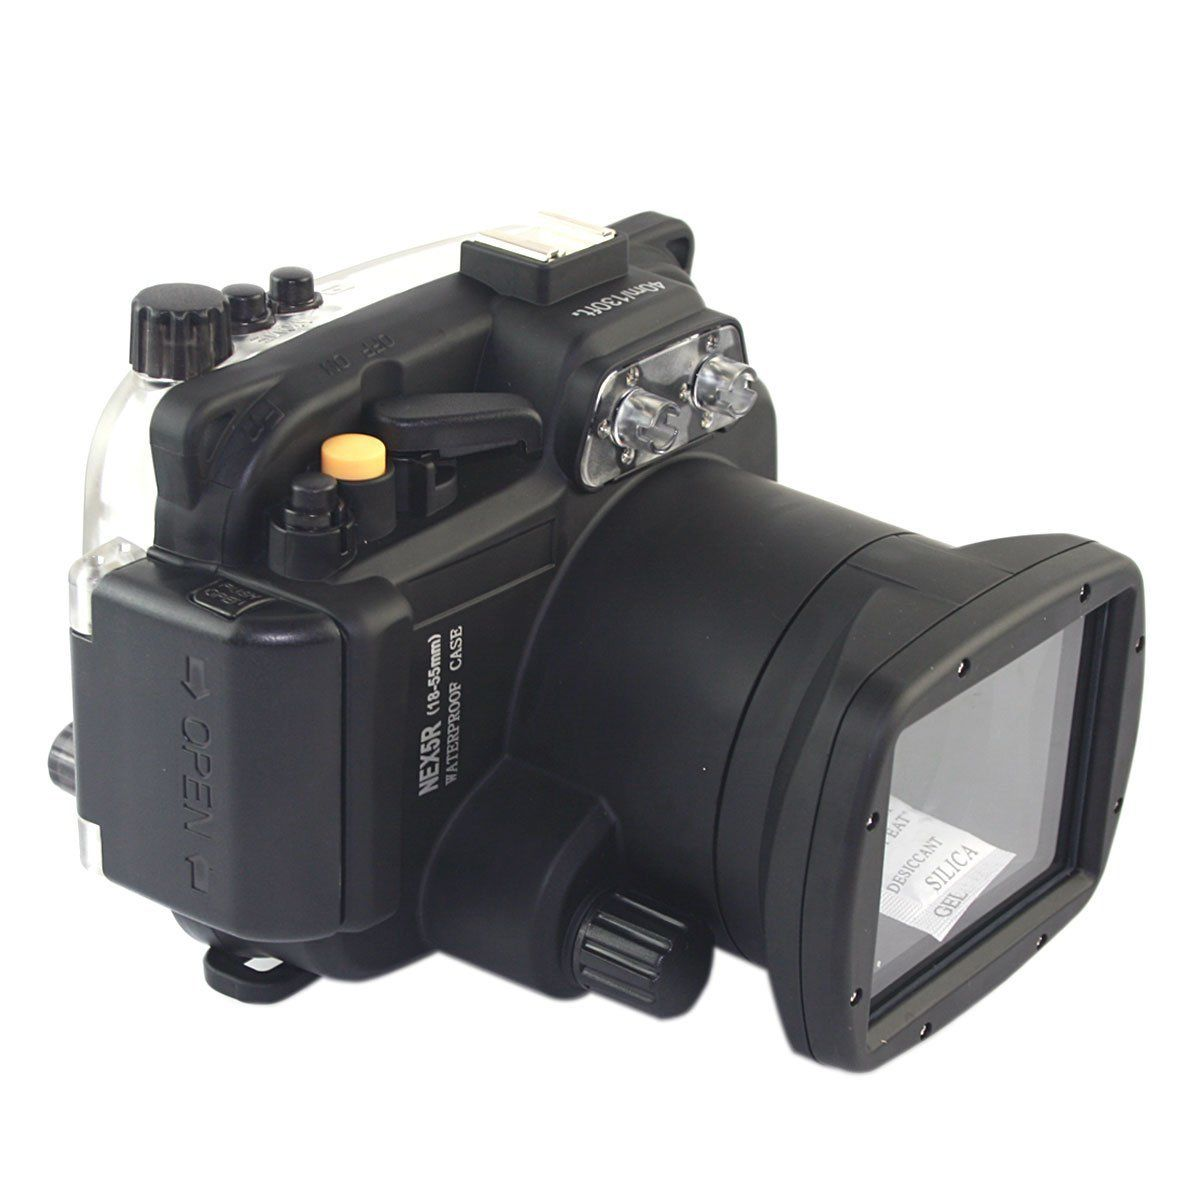 Waterproof Underwater Diving Housing Camera bag Case for Sony Alpha NEX-5R NEX5R 18-55mm Lens mcoplus 40m 130ft camera underwater housing waterproof shell case for nikon j5 10mm lens